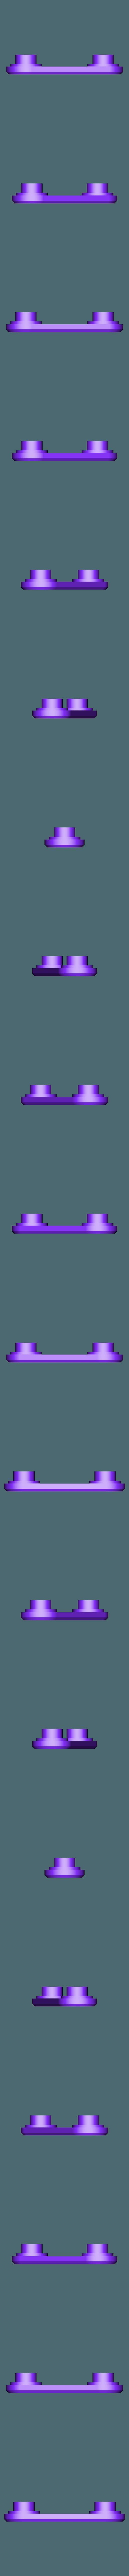 handspinnerV2_1.STL Download free STL file Fidget toy • 3D print object, seb2320